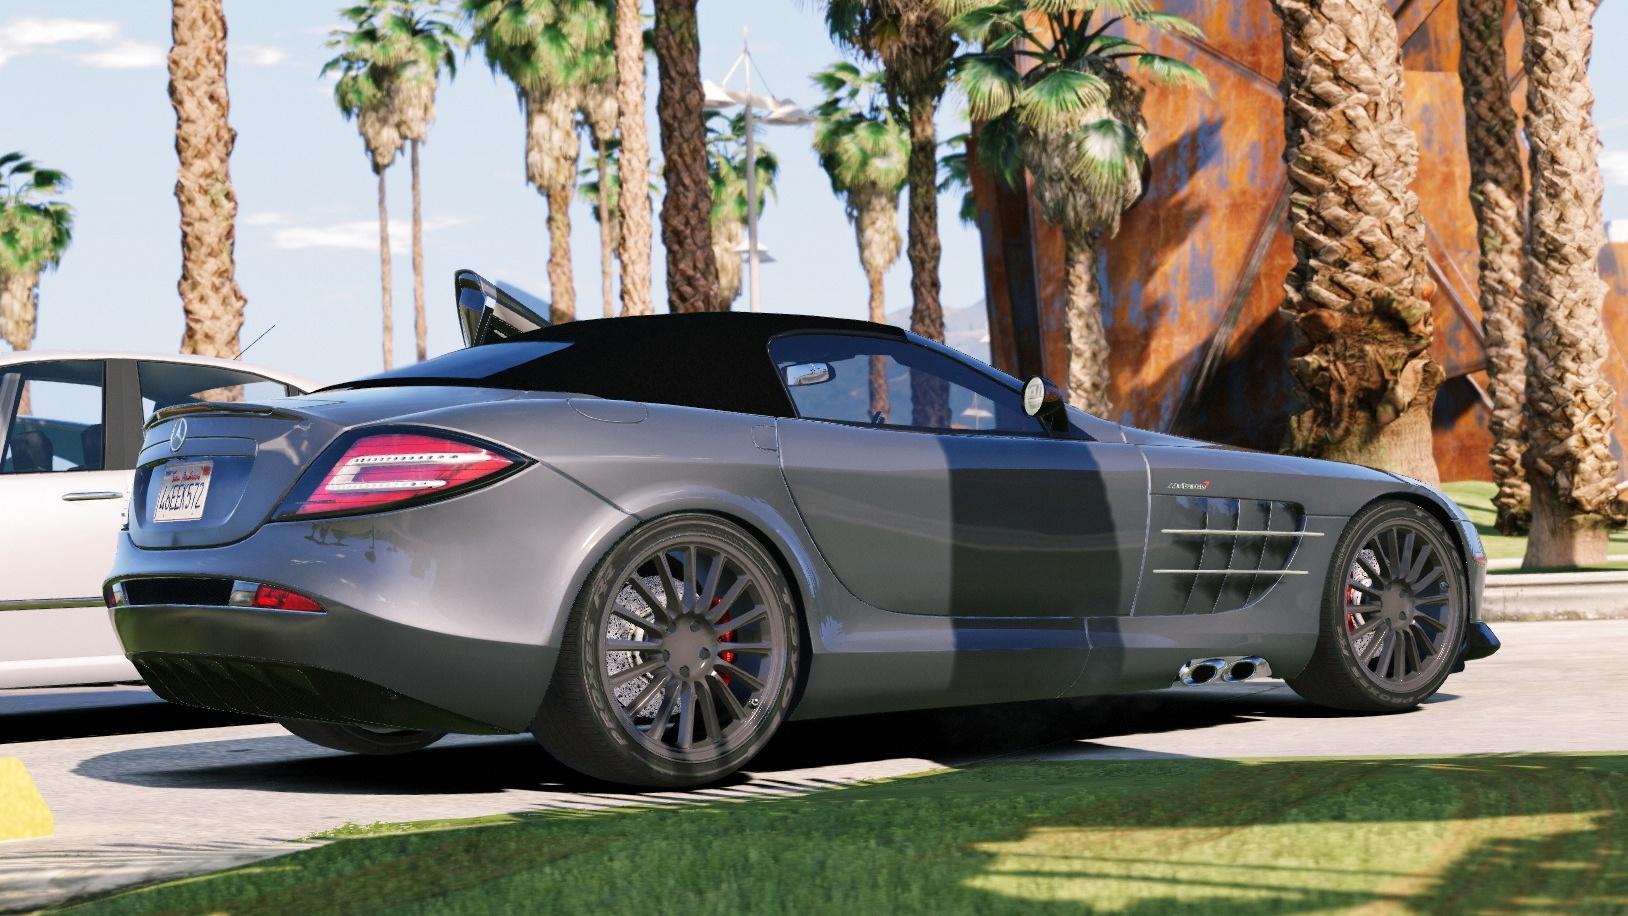 mercedes benz slr 722s roadster mansory add on autovista gta5. Black Bedroom Furniture Sets. Home Design Ideas